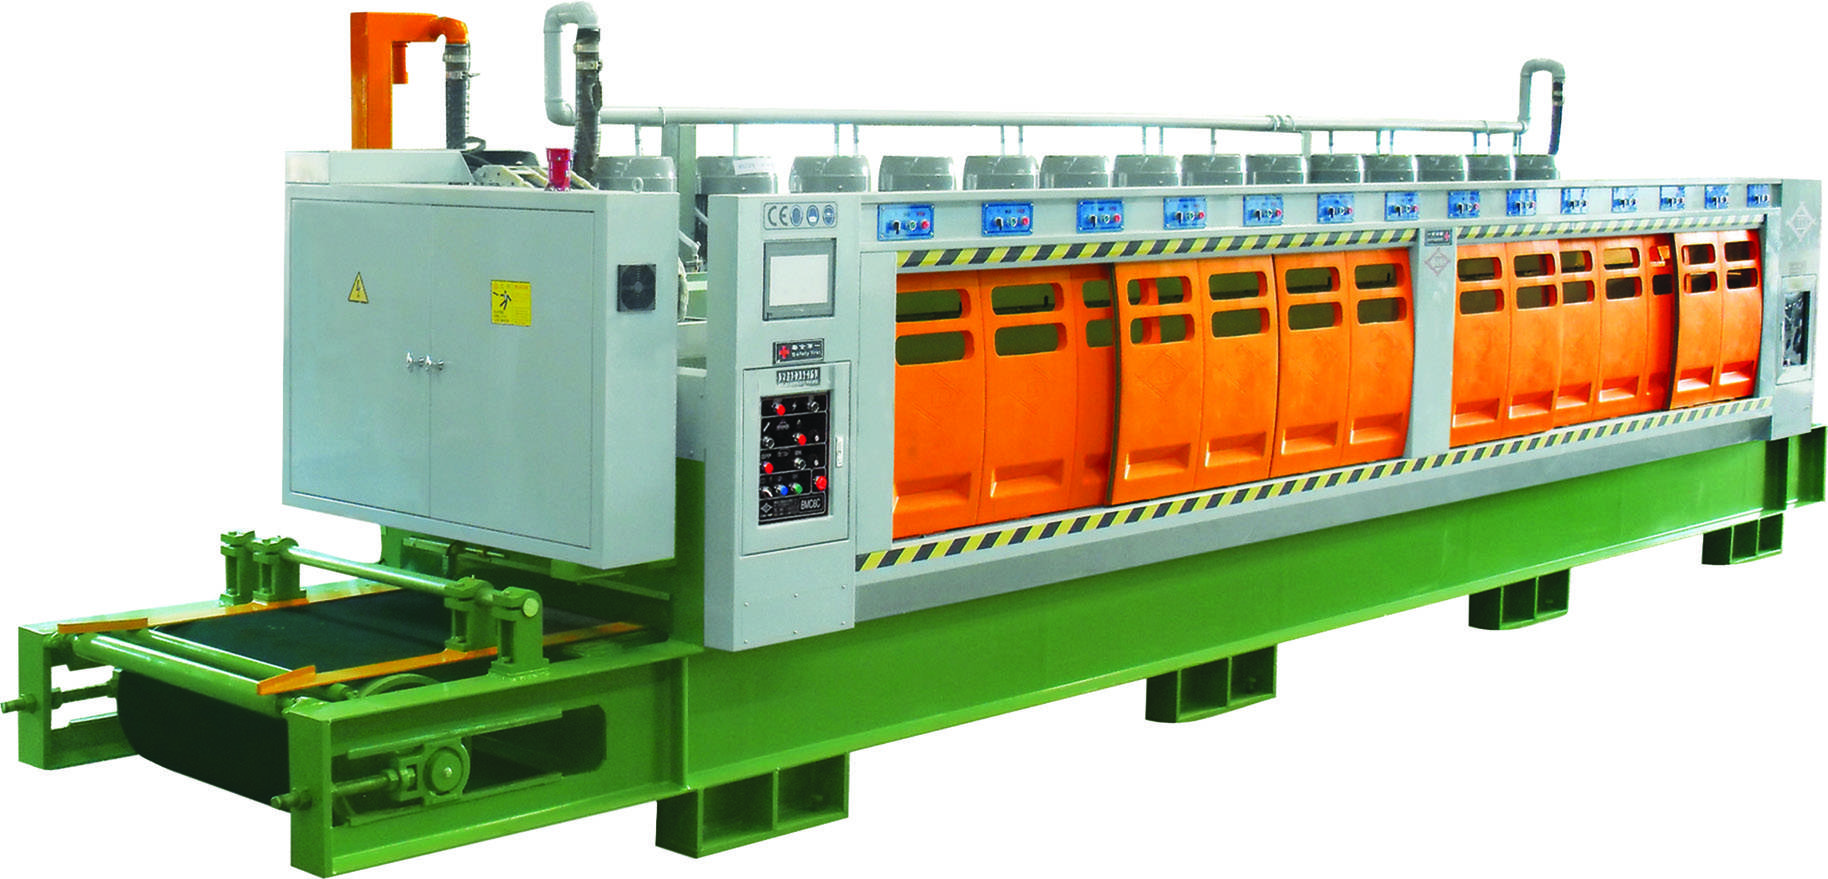 Automatic Marble/Terrazzo/Artificial Stone/Engineered Stone Polishing Machine (For Tile) CB/CBM-6C/8